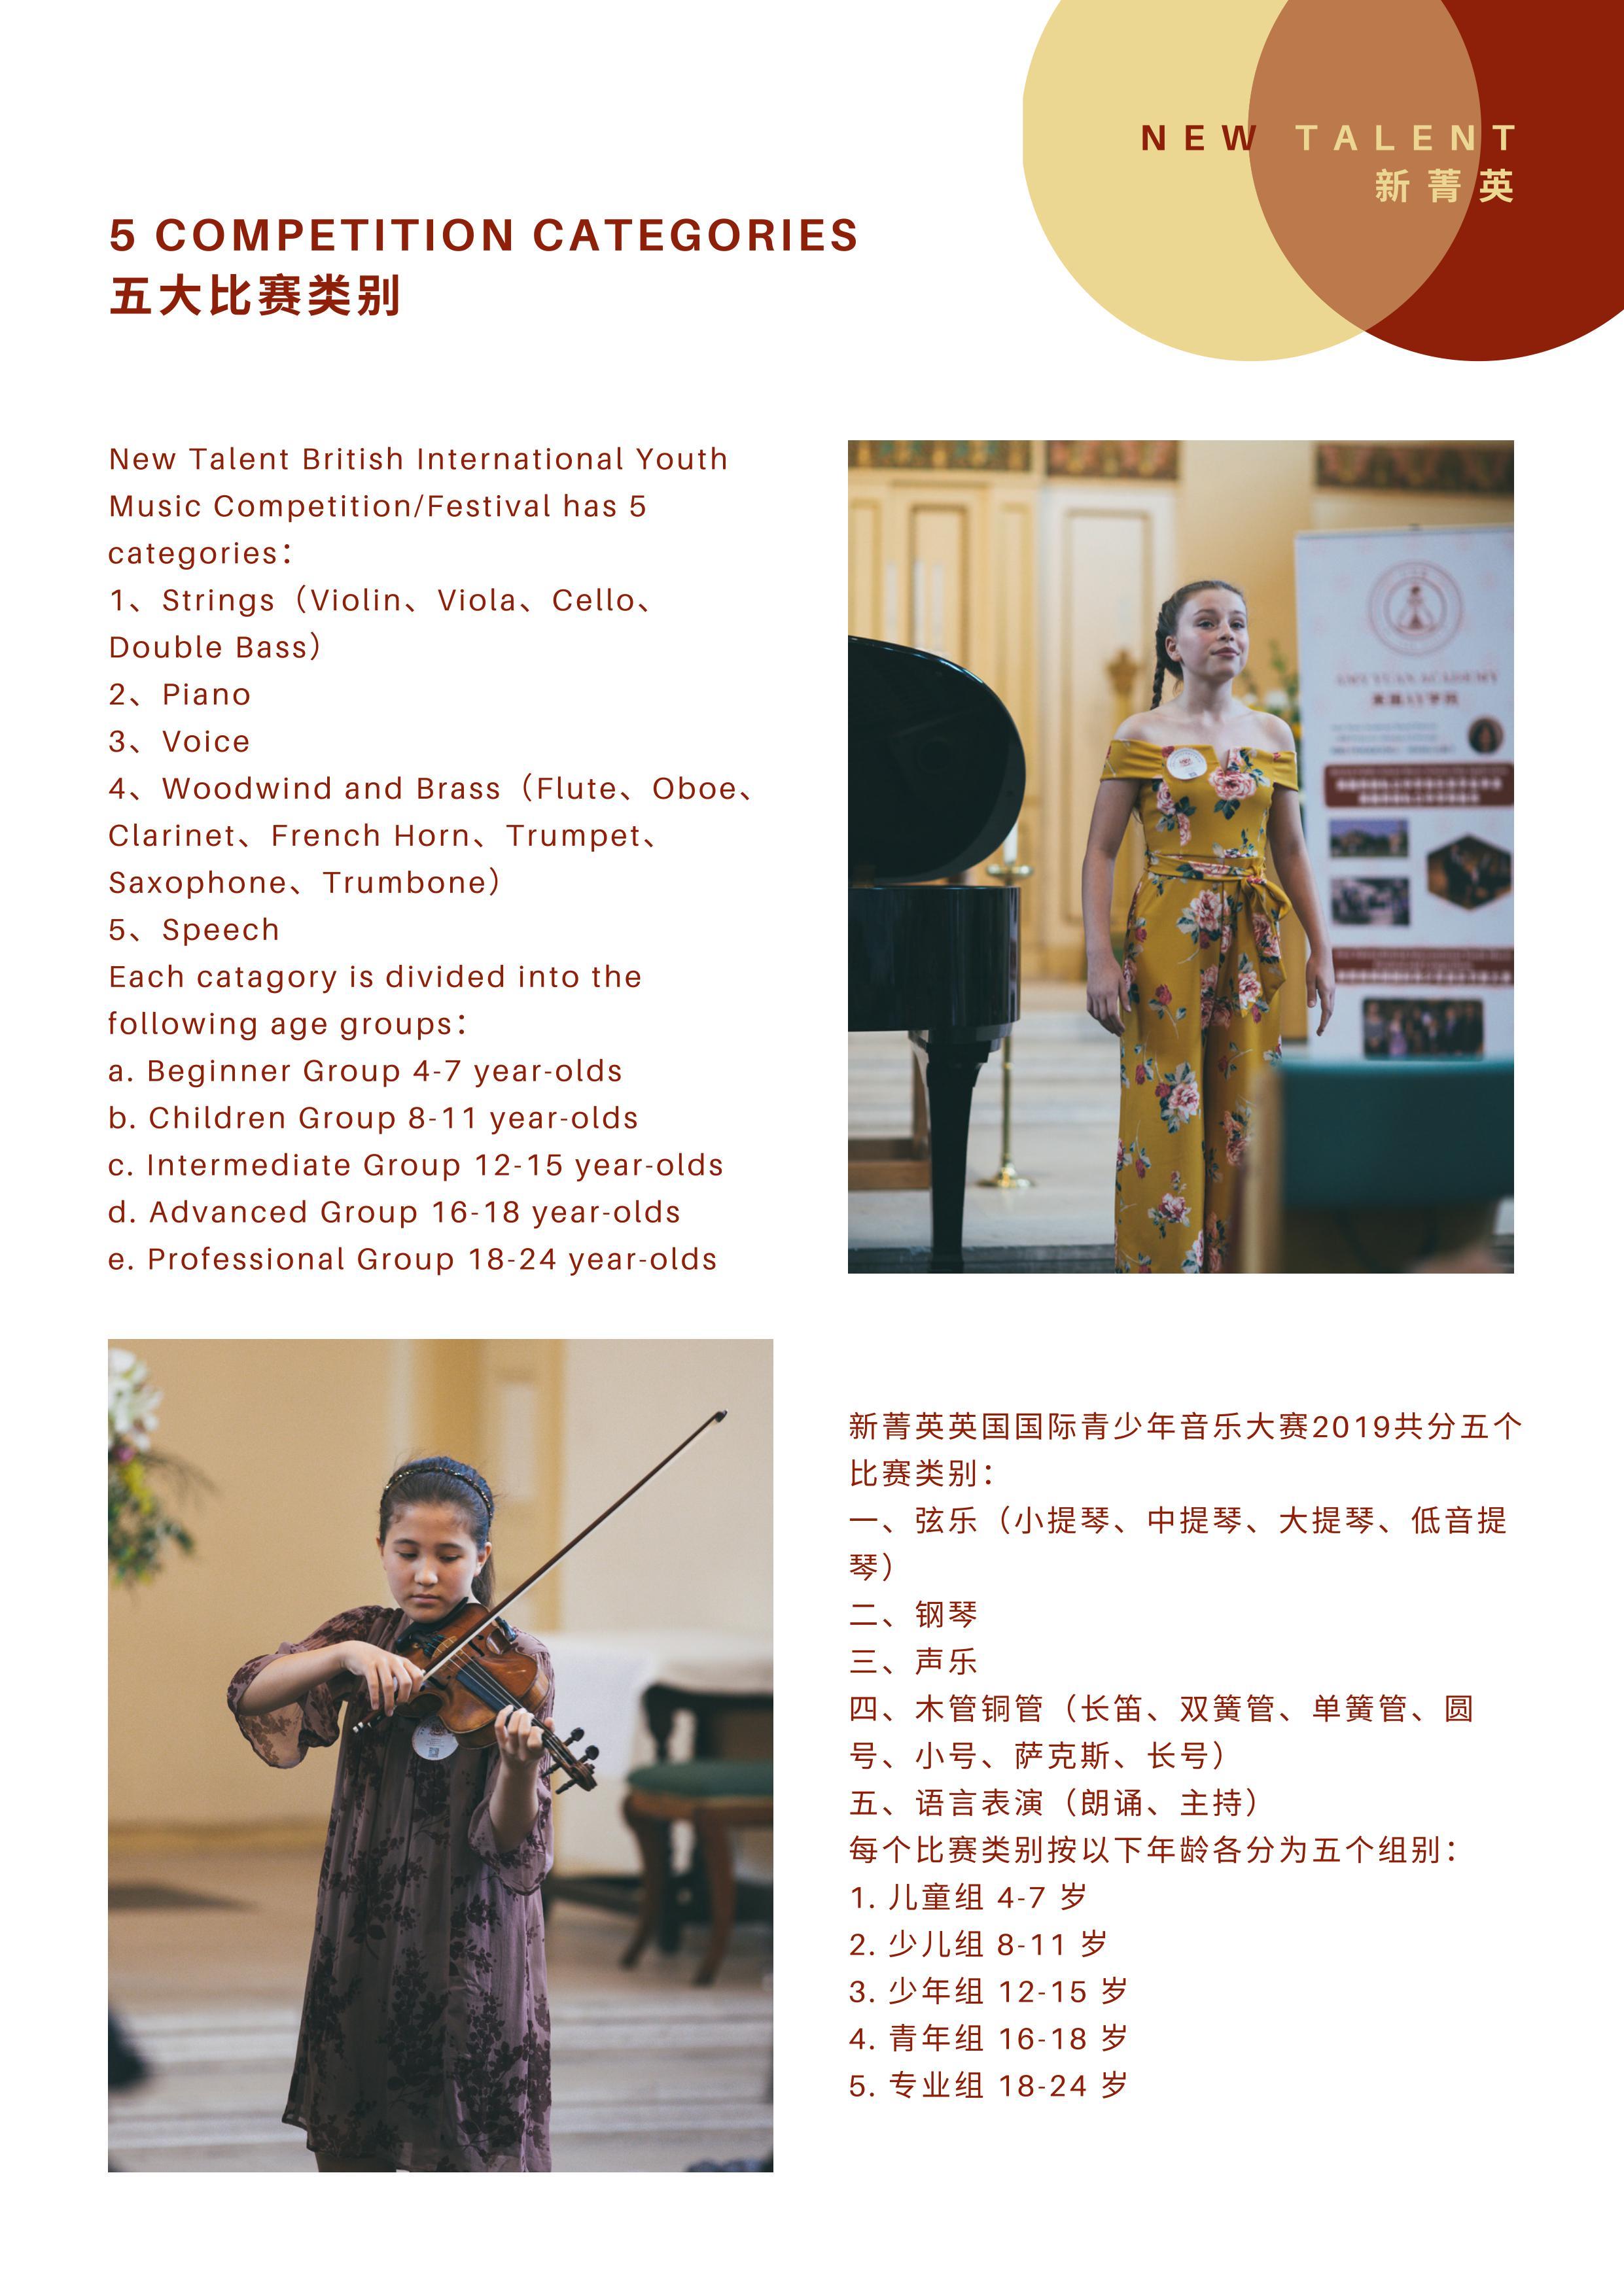 Amy Yuan Academy 2019 Brochure6.jpg